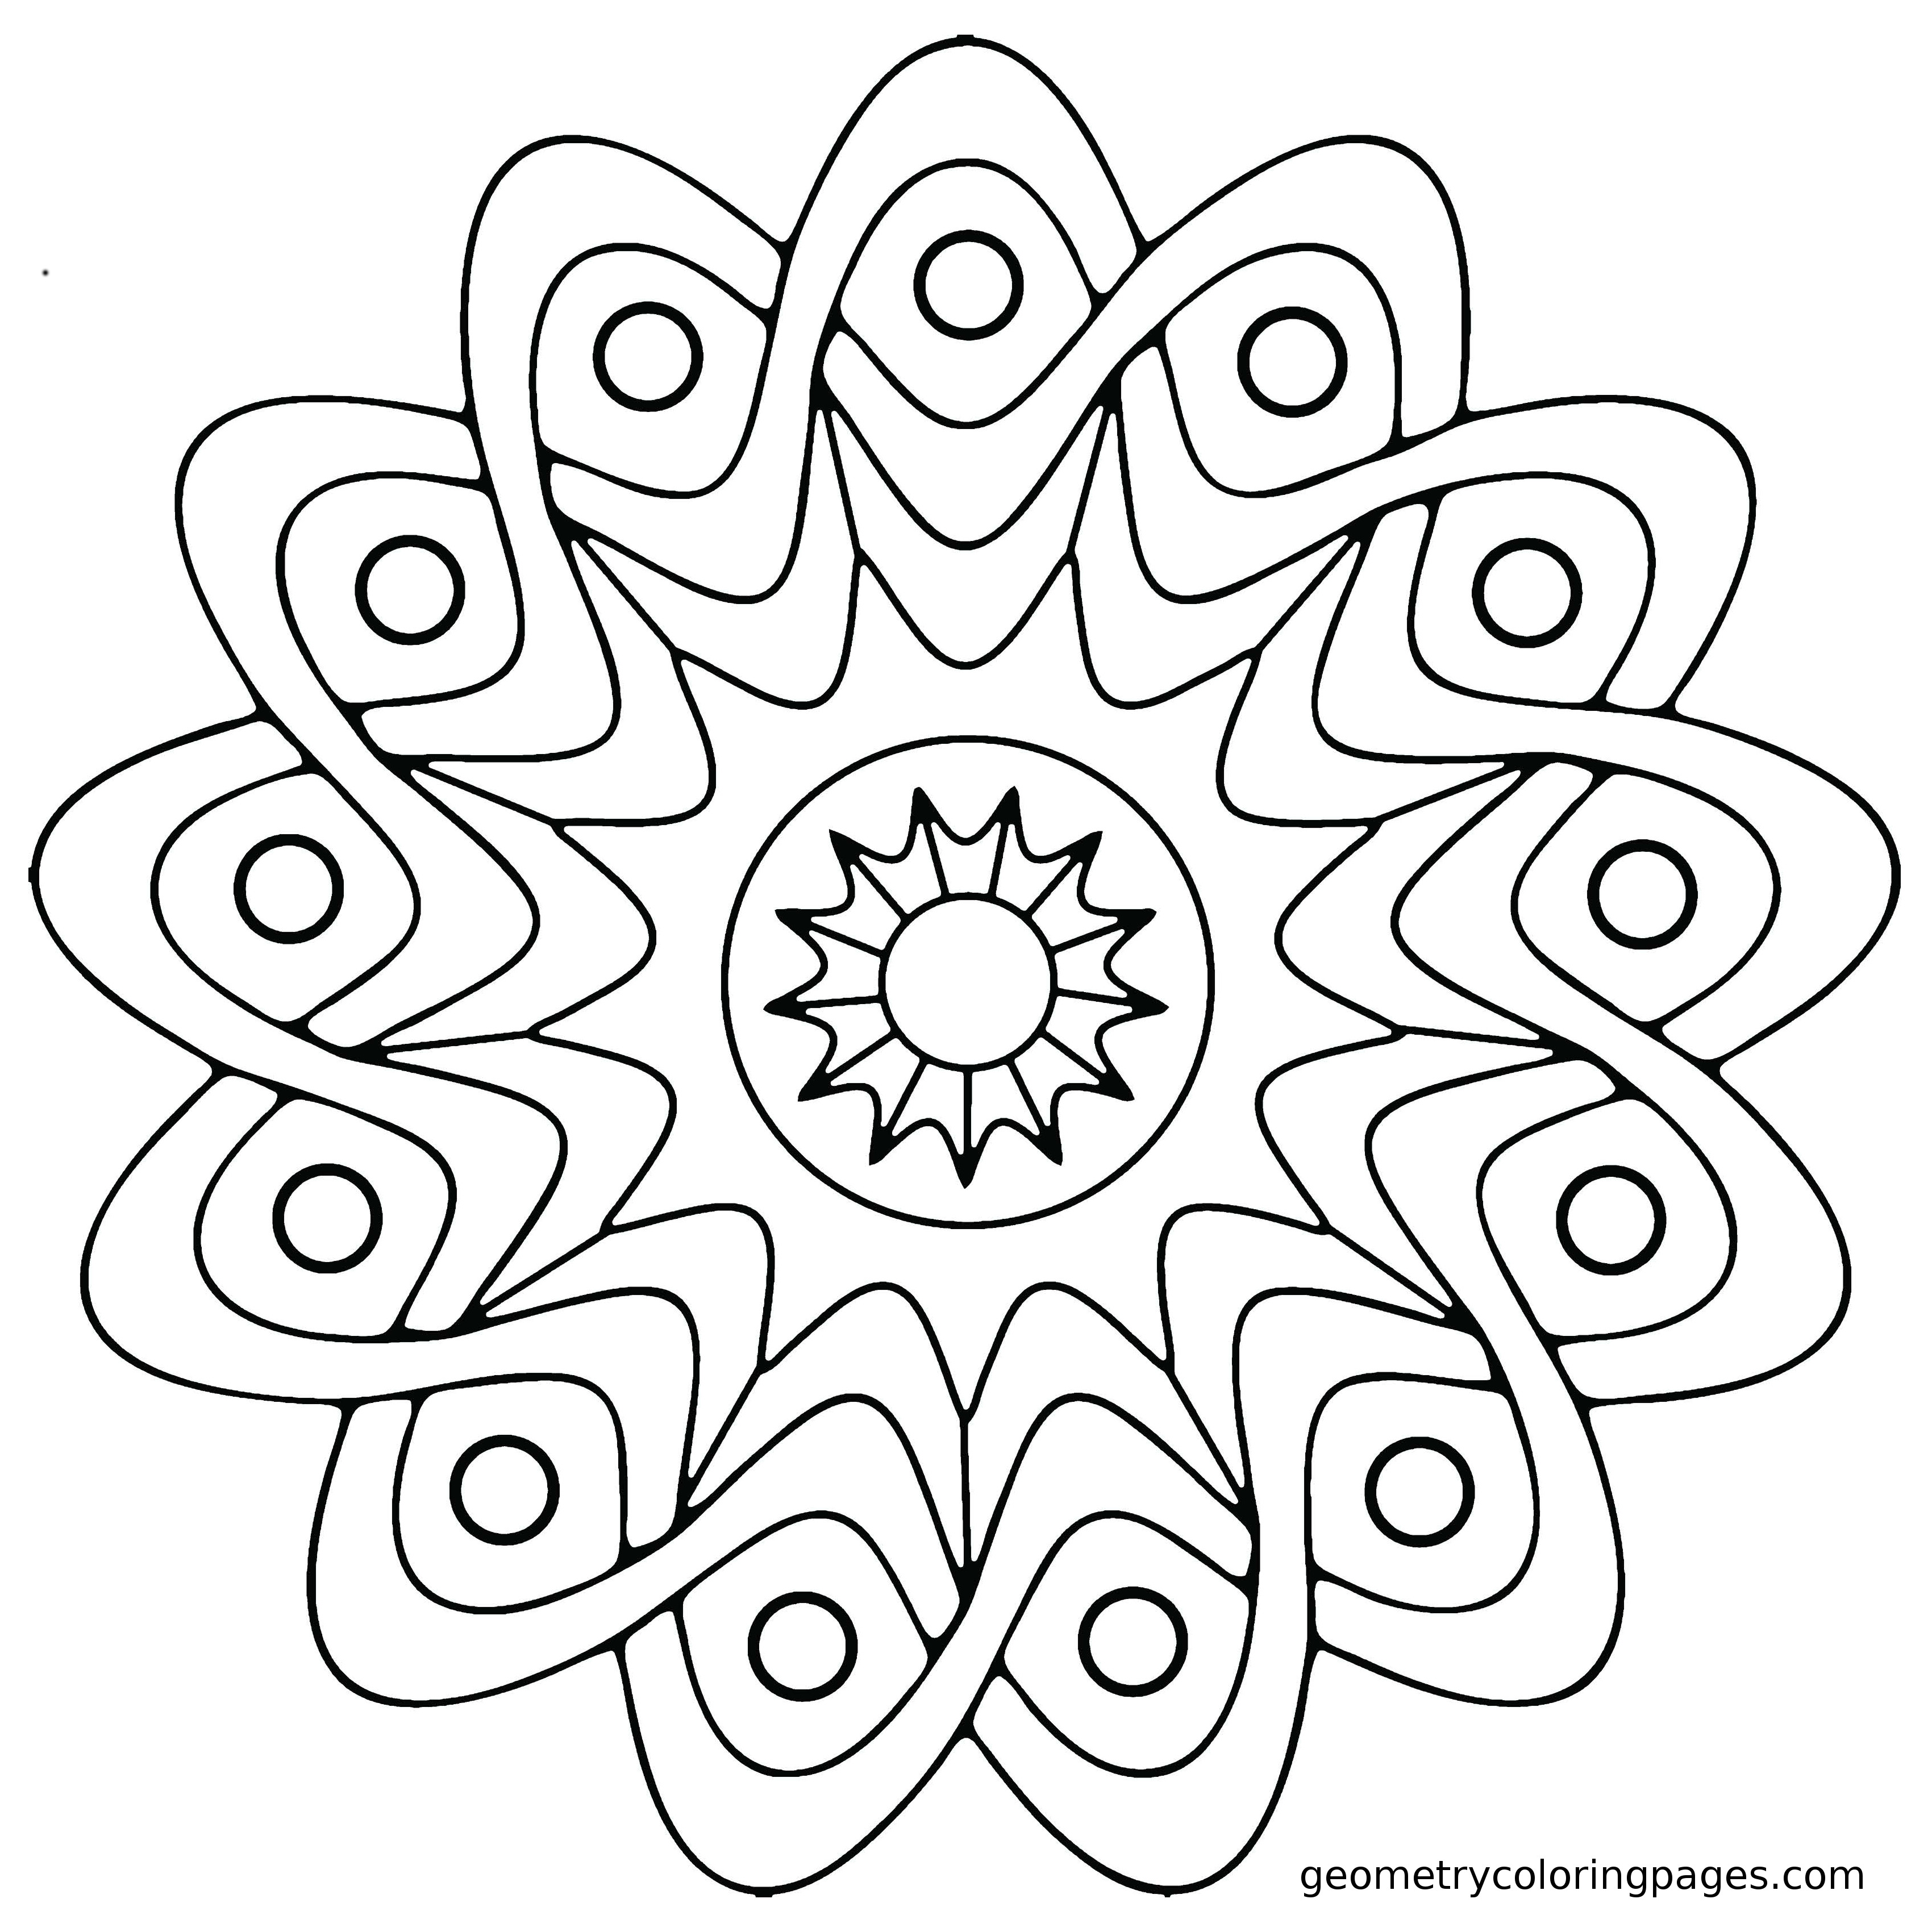 3400x3400 Mandala Coloring Pages Pdf Easy At